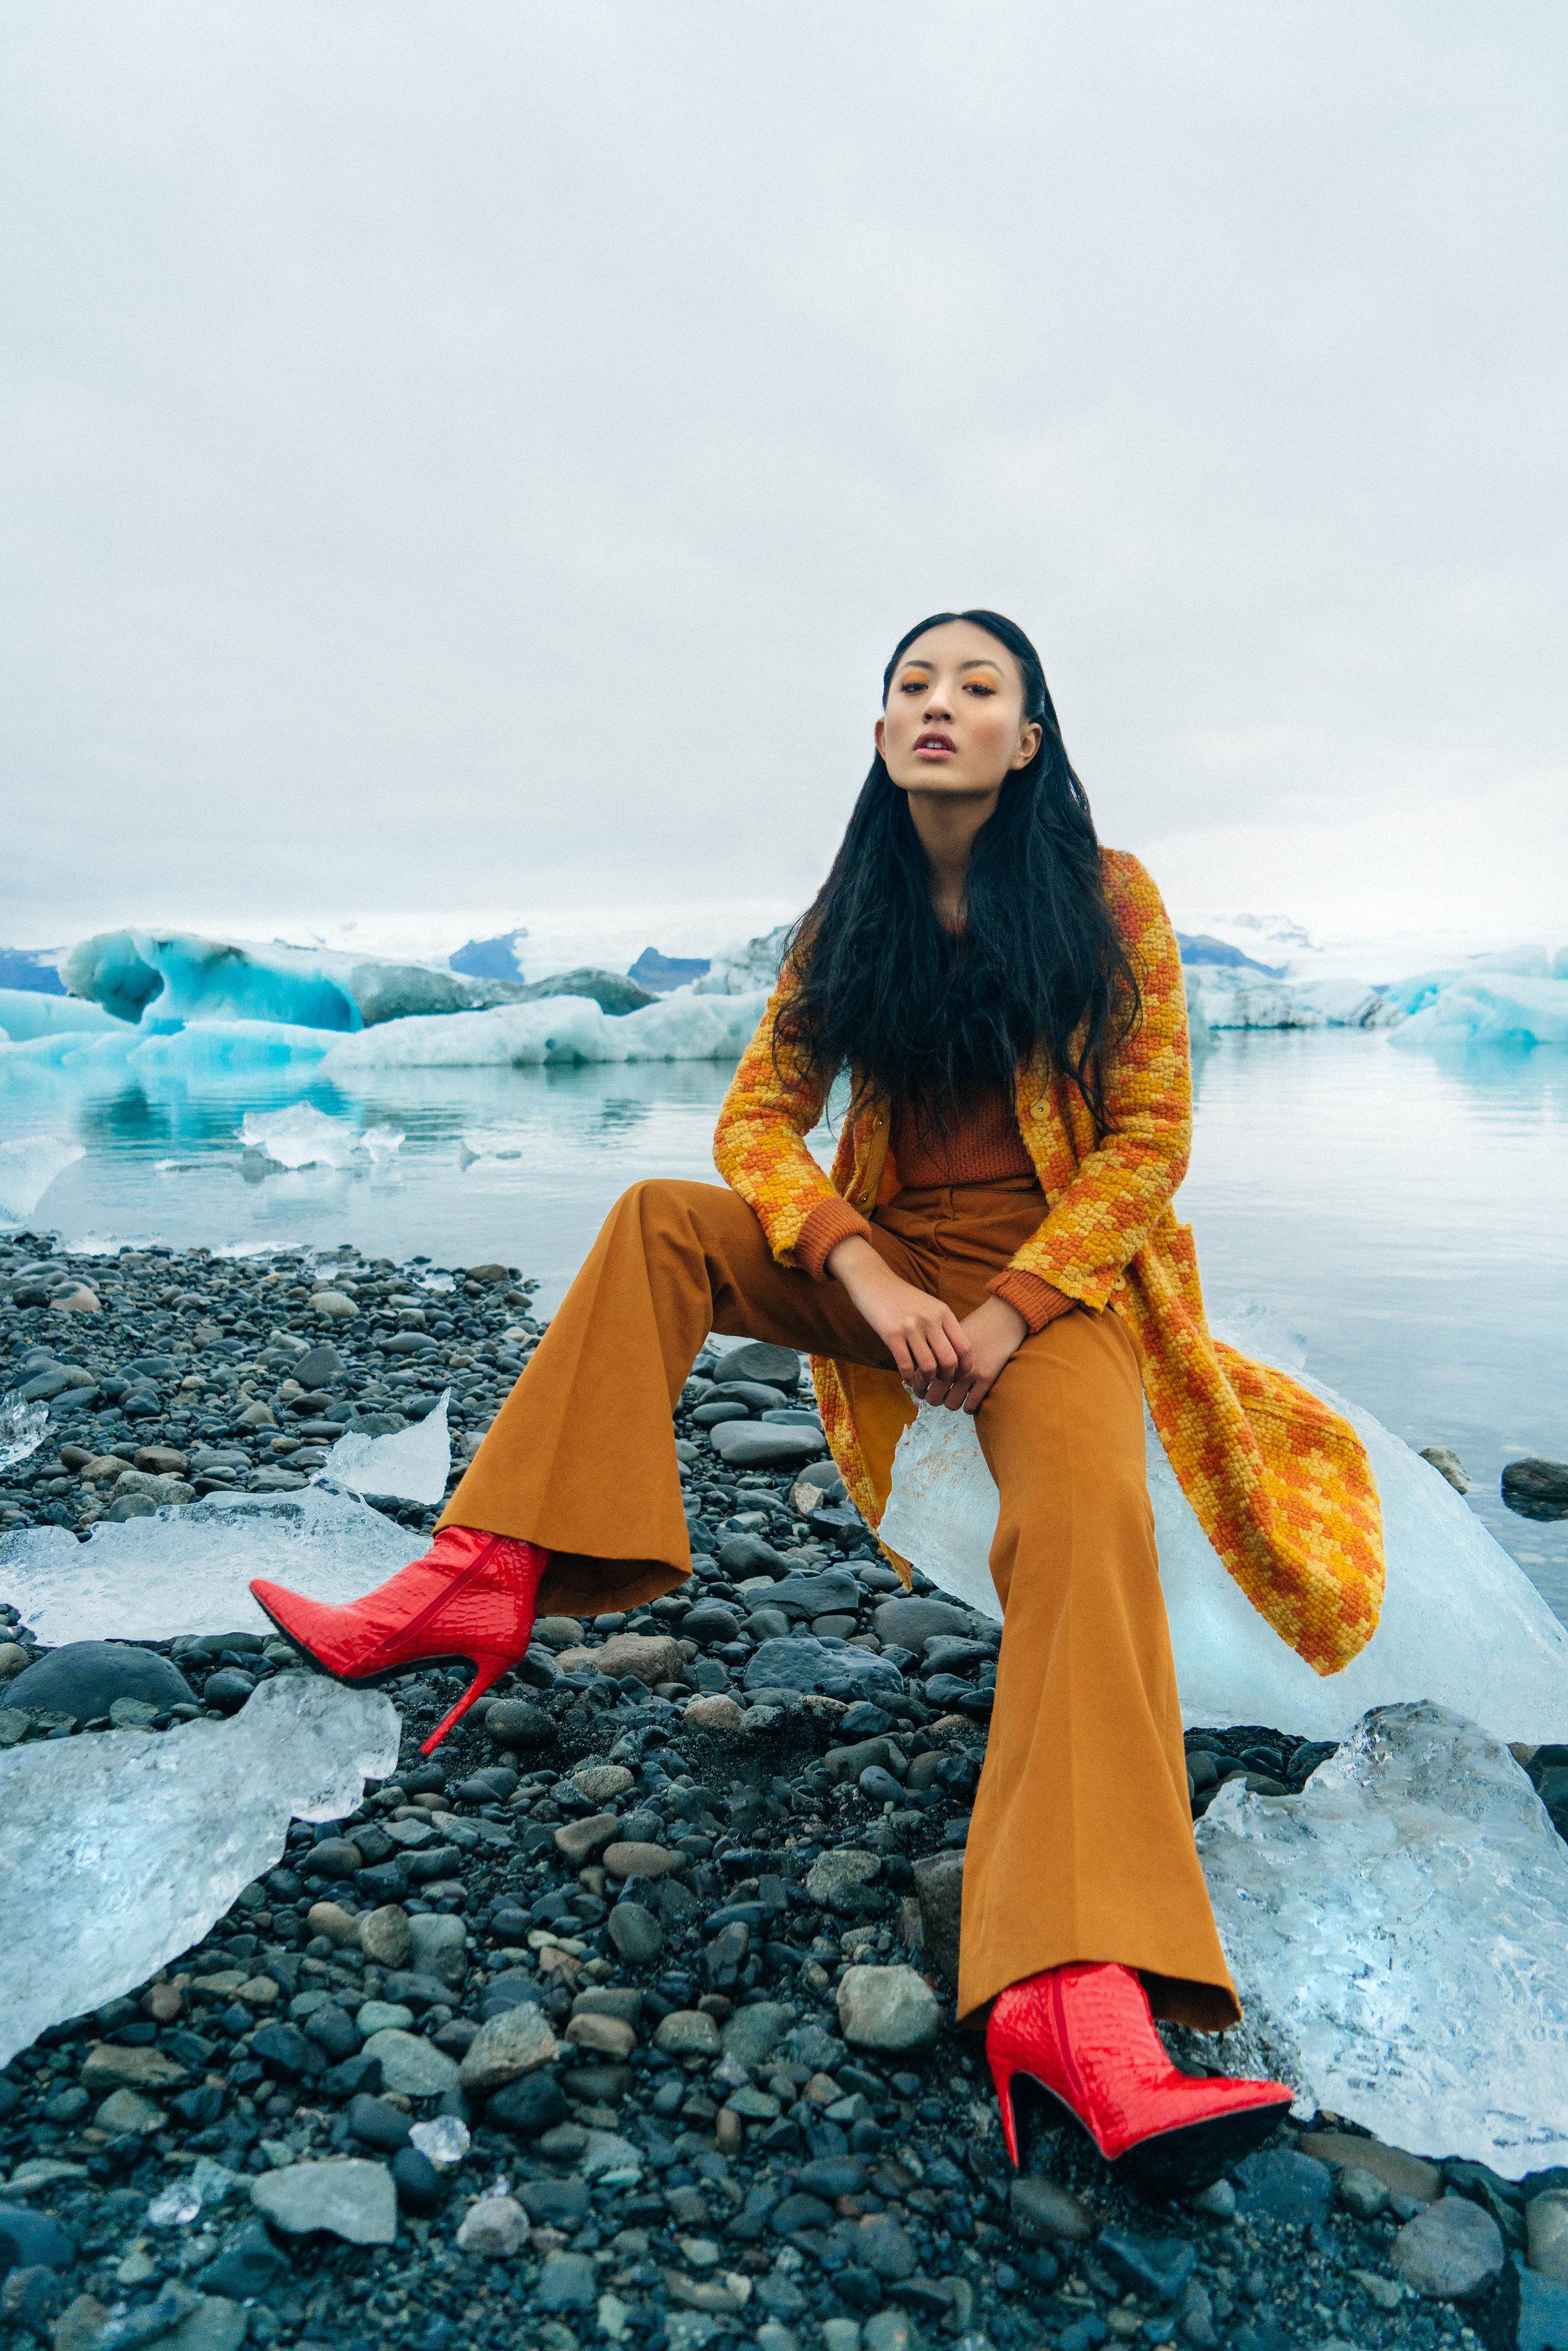 Evolution of a Woman  Photographer & Stylist: Stacie Yue  Model: Jiajing Yi  Hair & Makeup: Abigail Hill